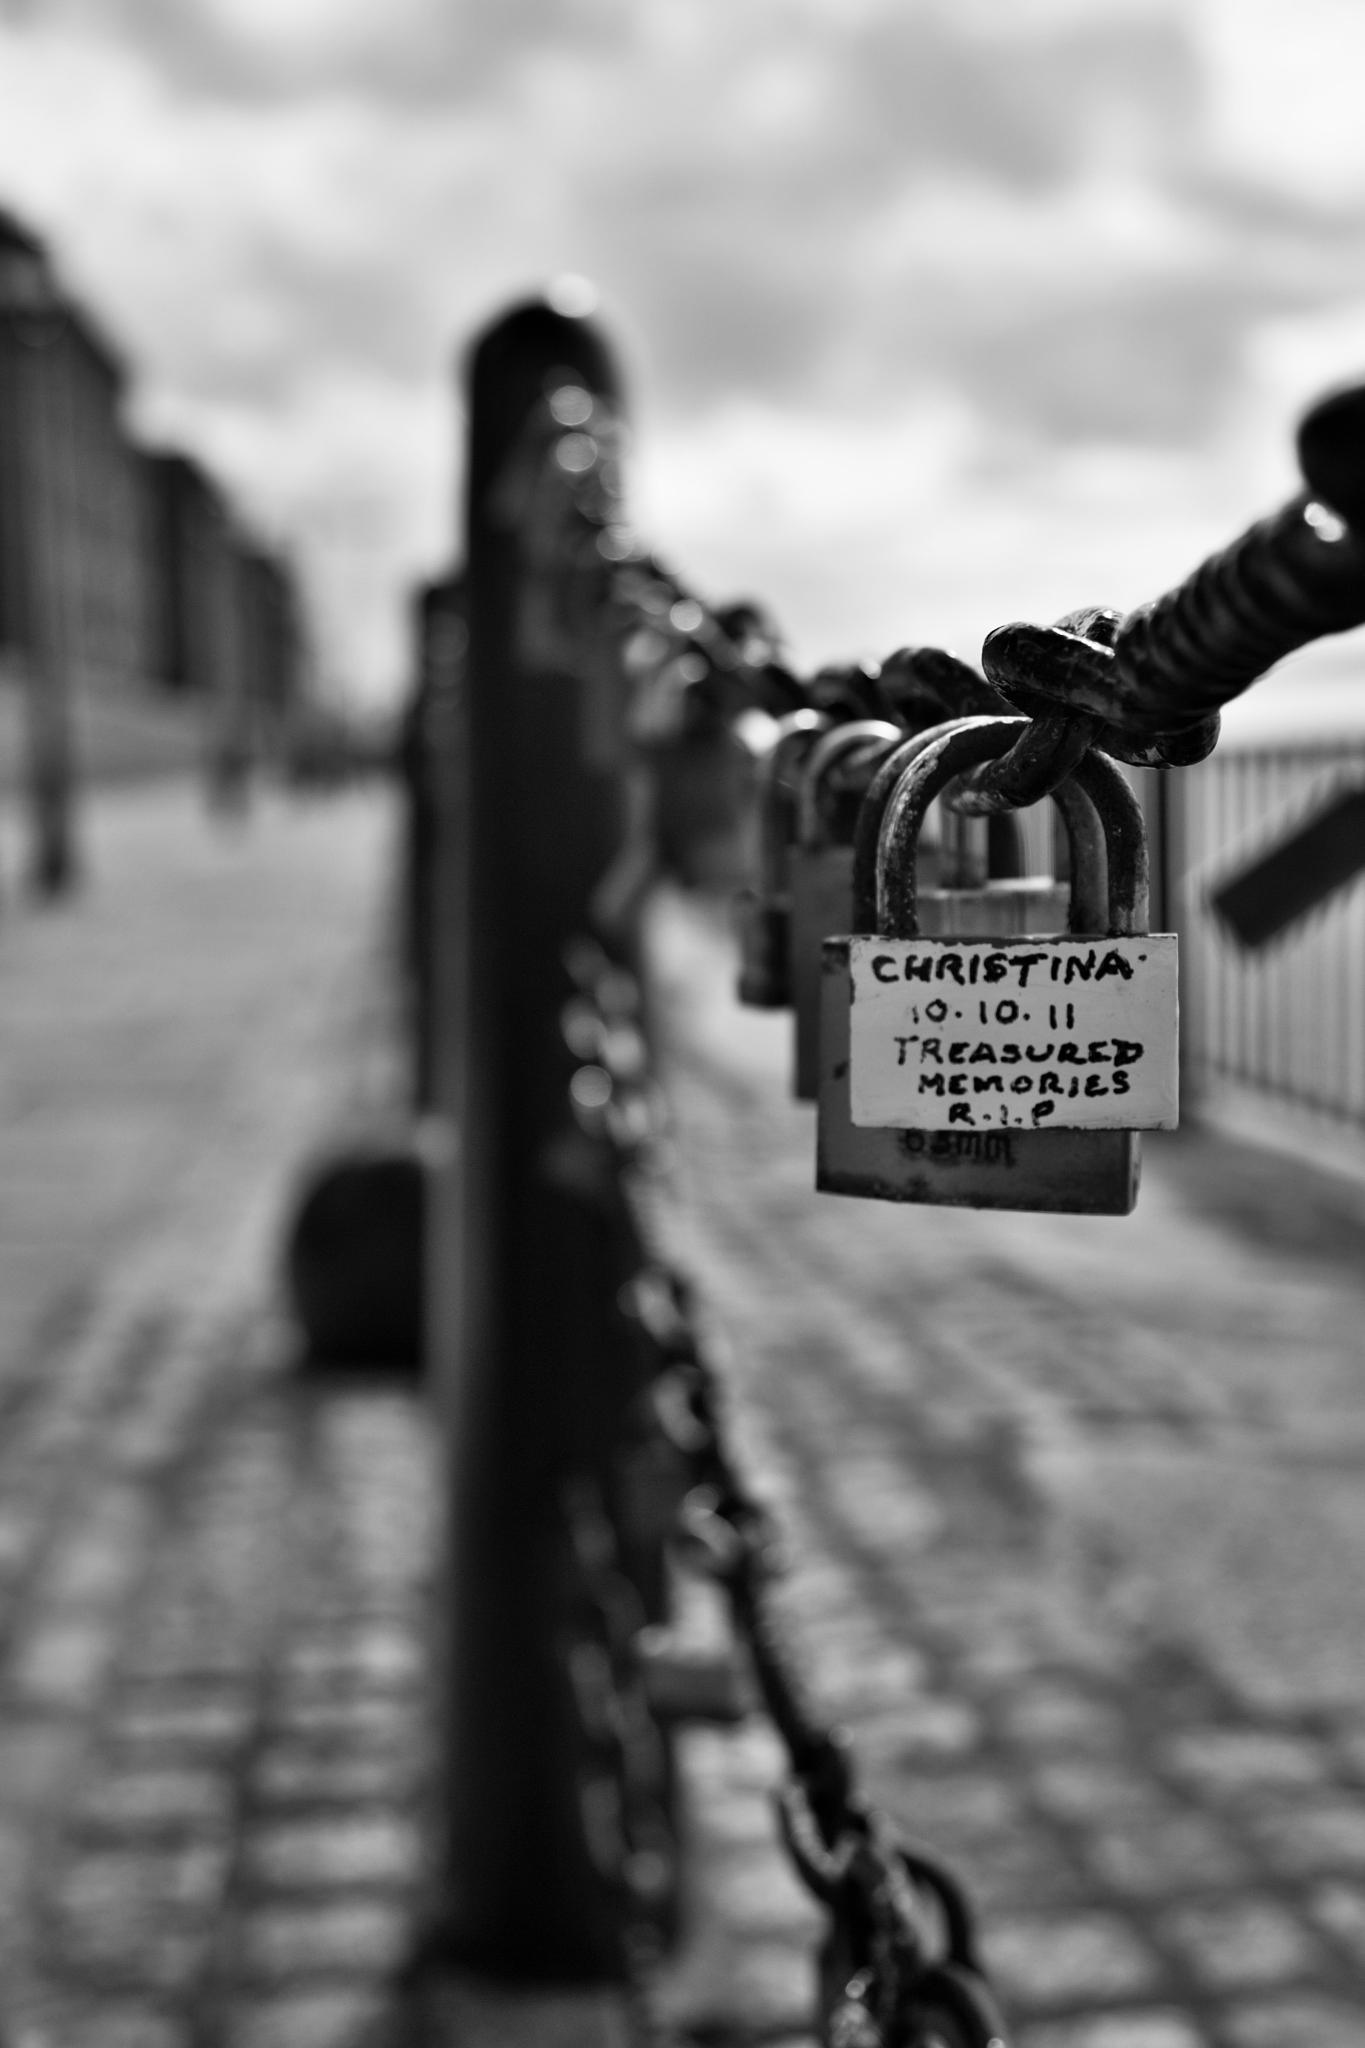 Memories under lock and key by Craig Coleran